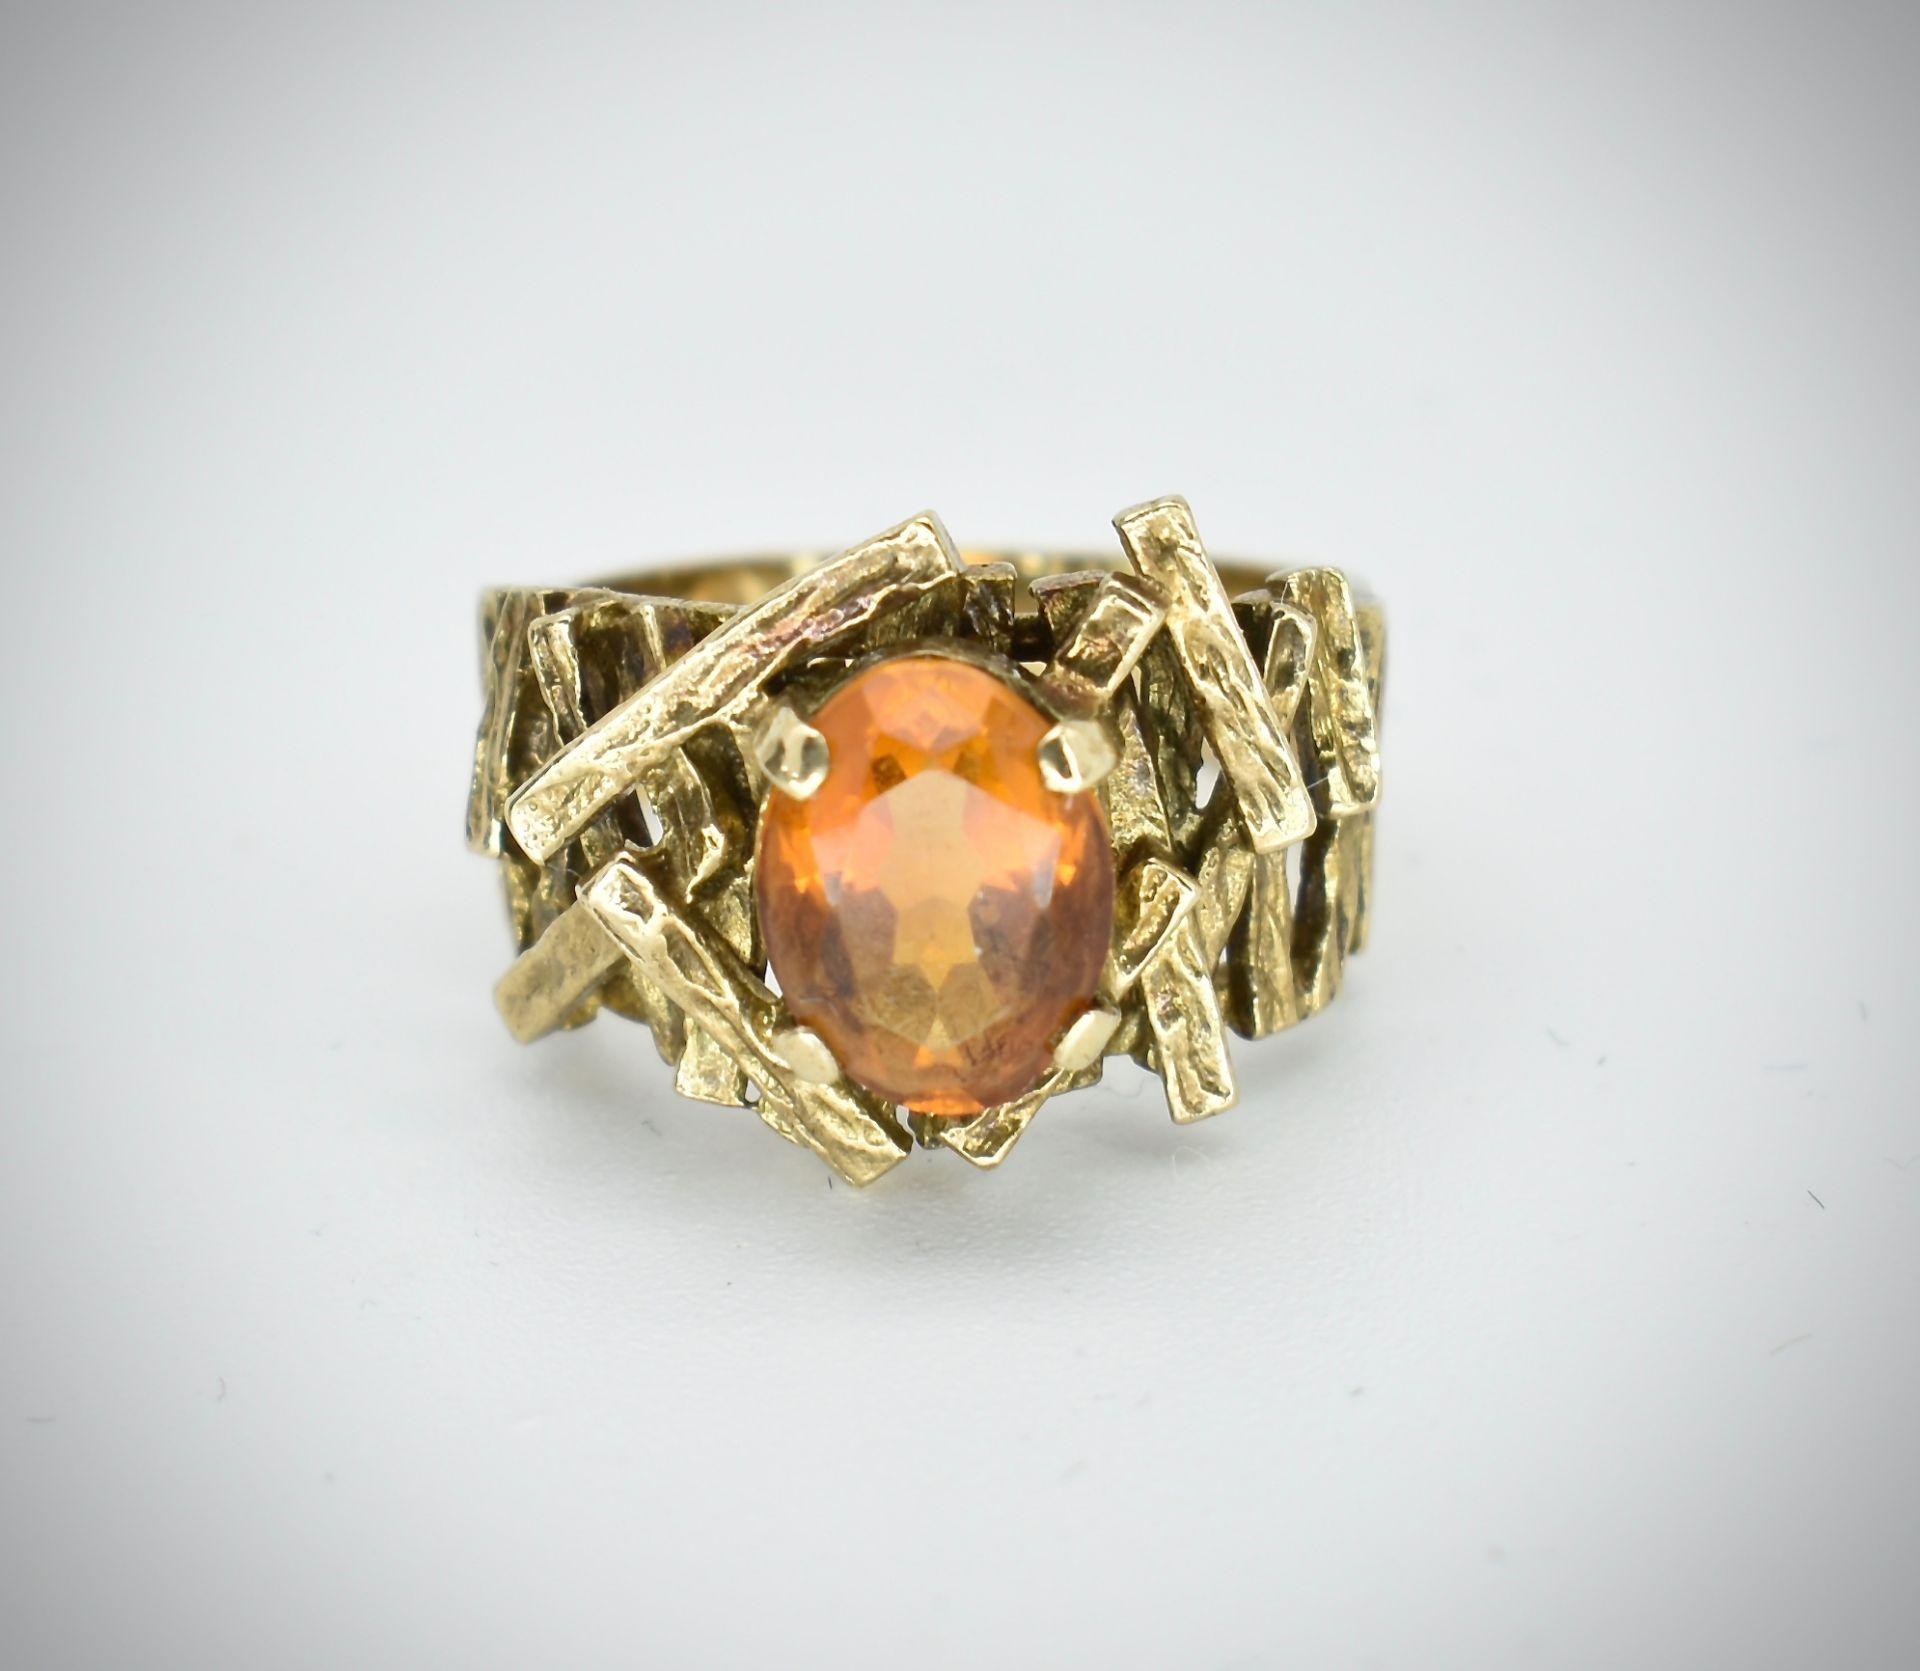 9ct Gold & Citrine Hallmarked 1960's Designer Ring - - Image 2 of 6